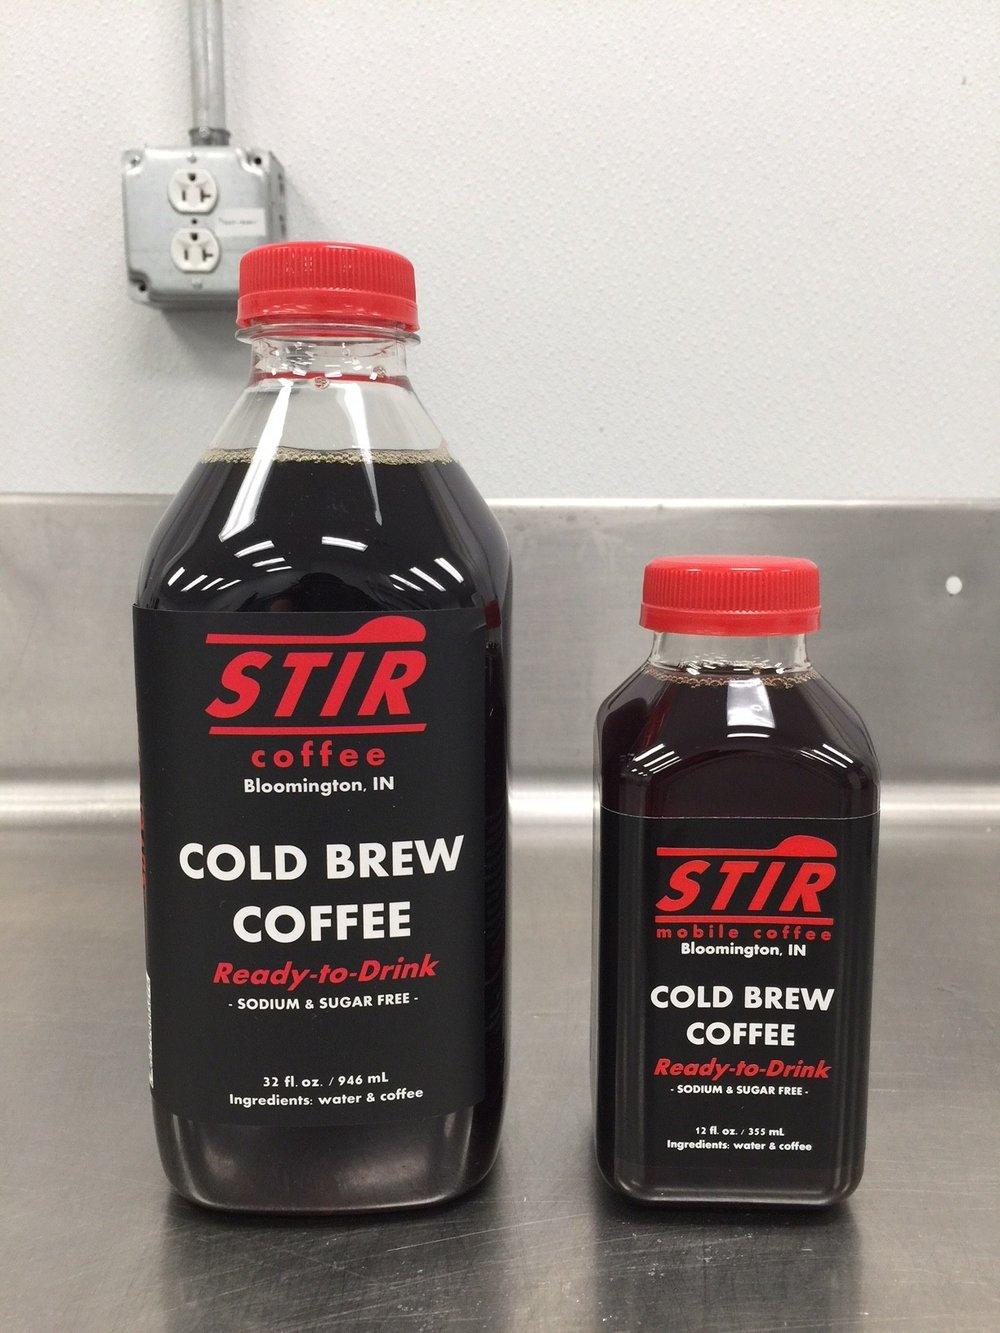 The BIG STIR (32 oz. / 946 mL) @ $7.99 vs. The Little STIR (12 oz. / 355 mL) @ $3.49